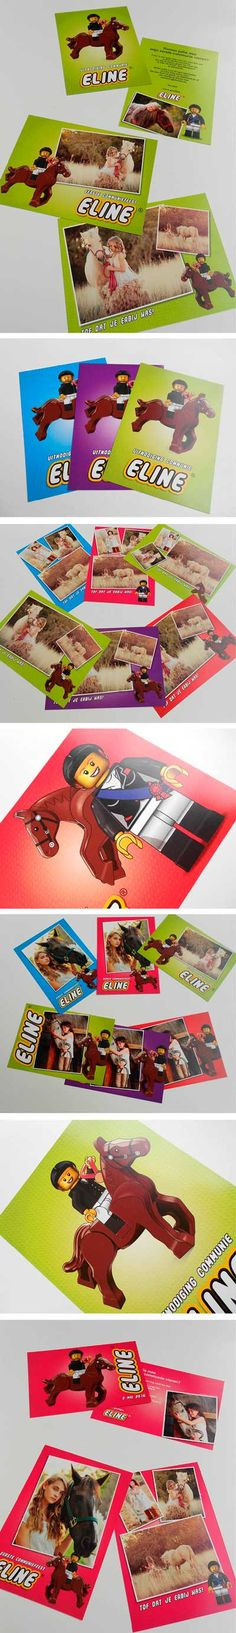 Lego paardjes communiekaartjes